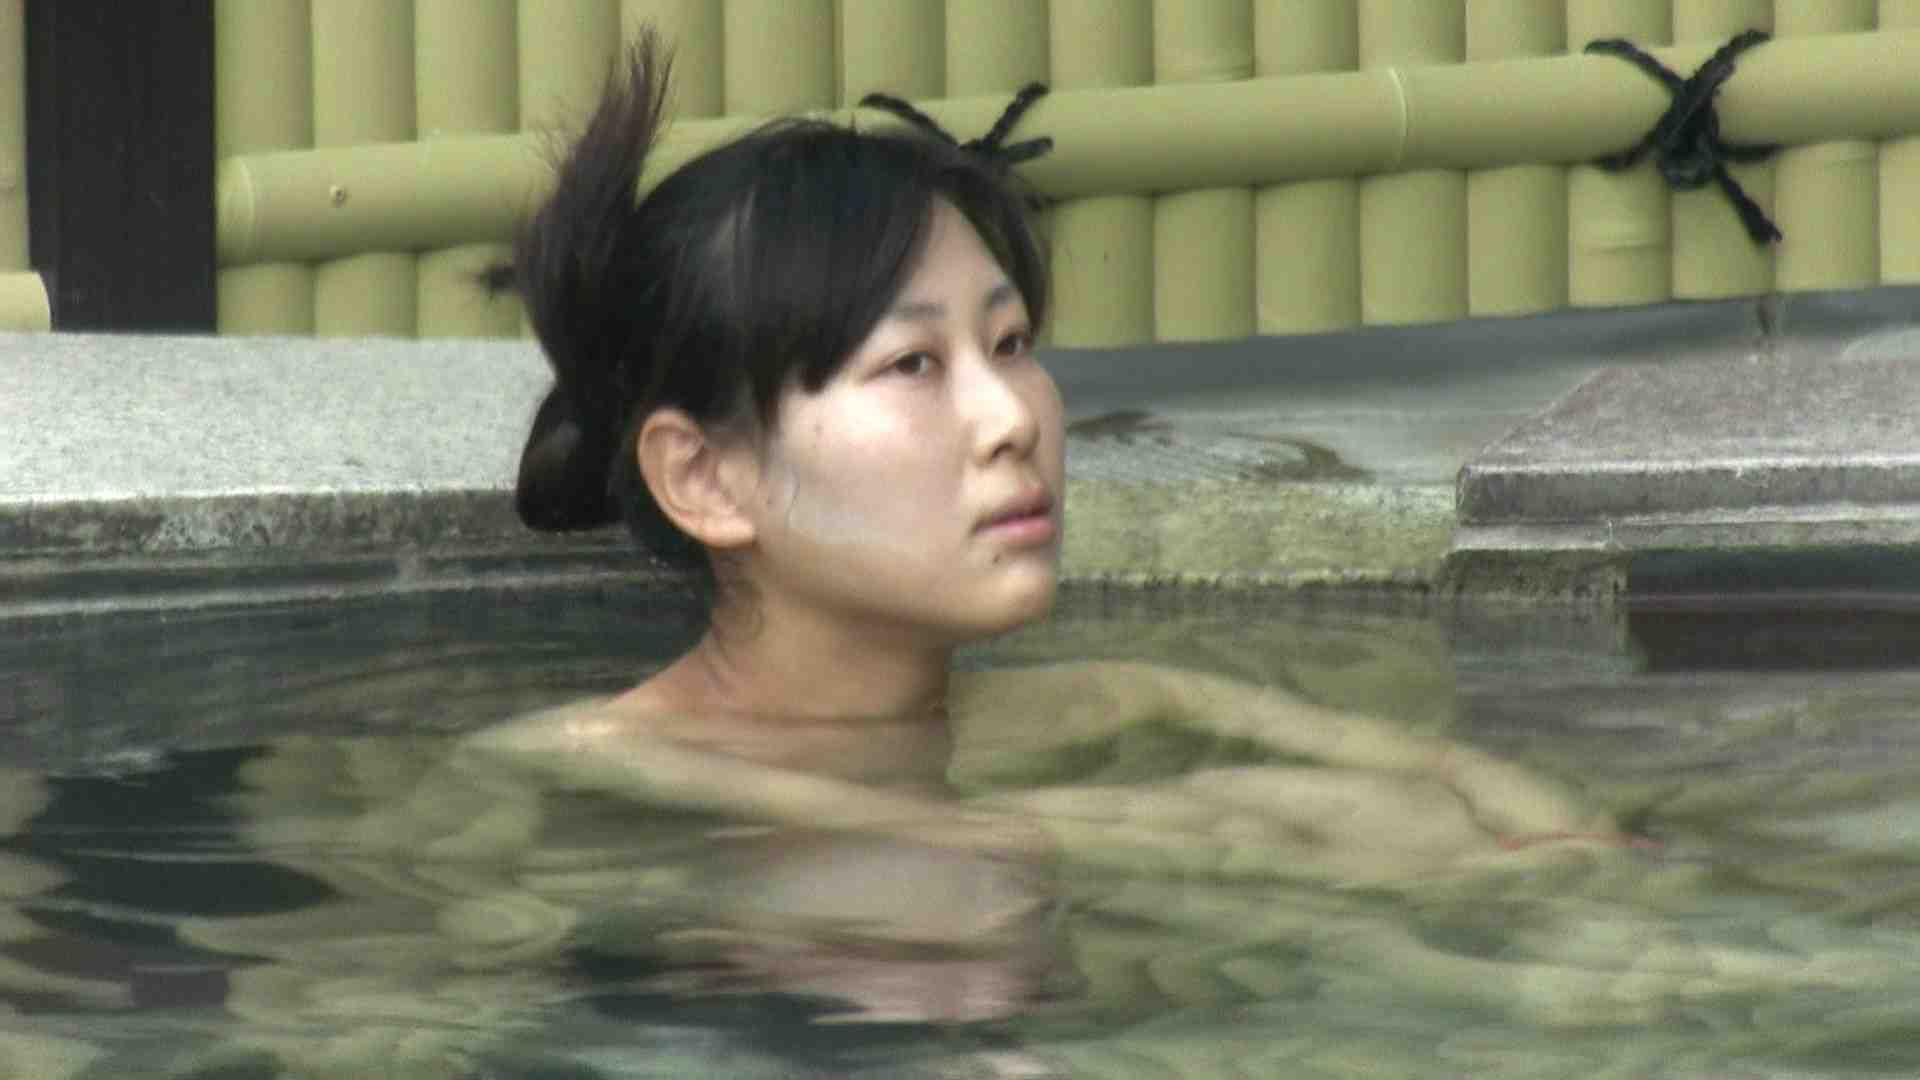 Aquaな露天風呂Vol.665 HなOL   盗撮  104pic 40